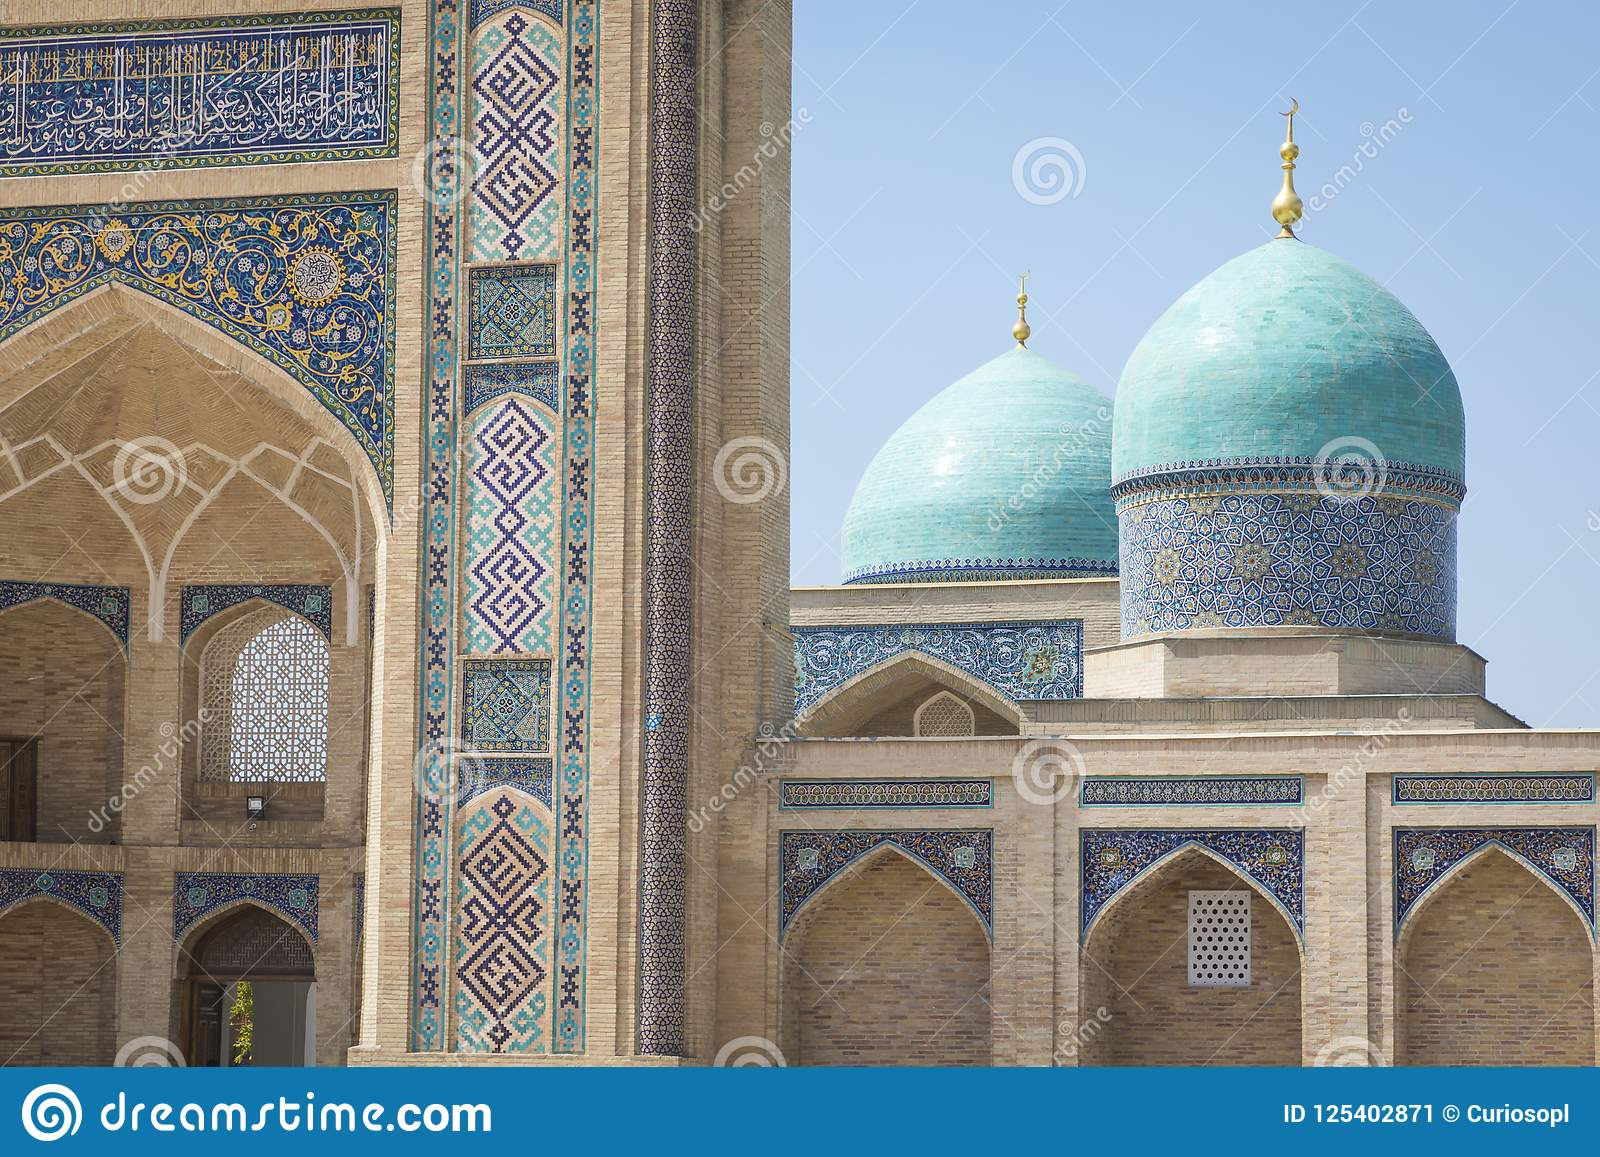 Barak Khan madrasah. Hast Imam Square Hazrati Imam is a religi